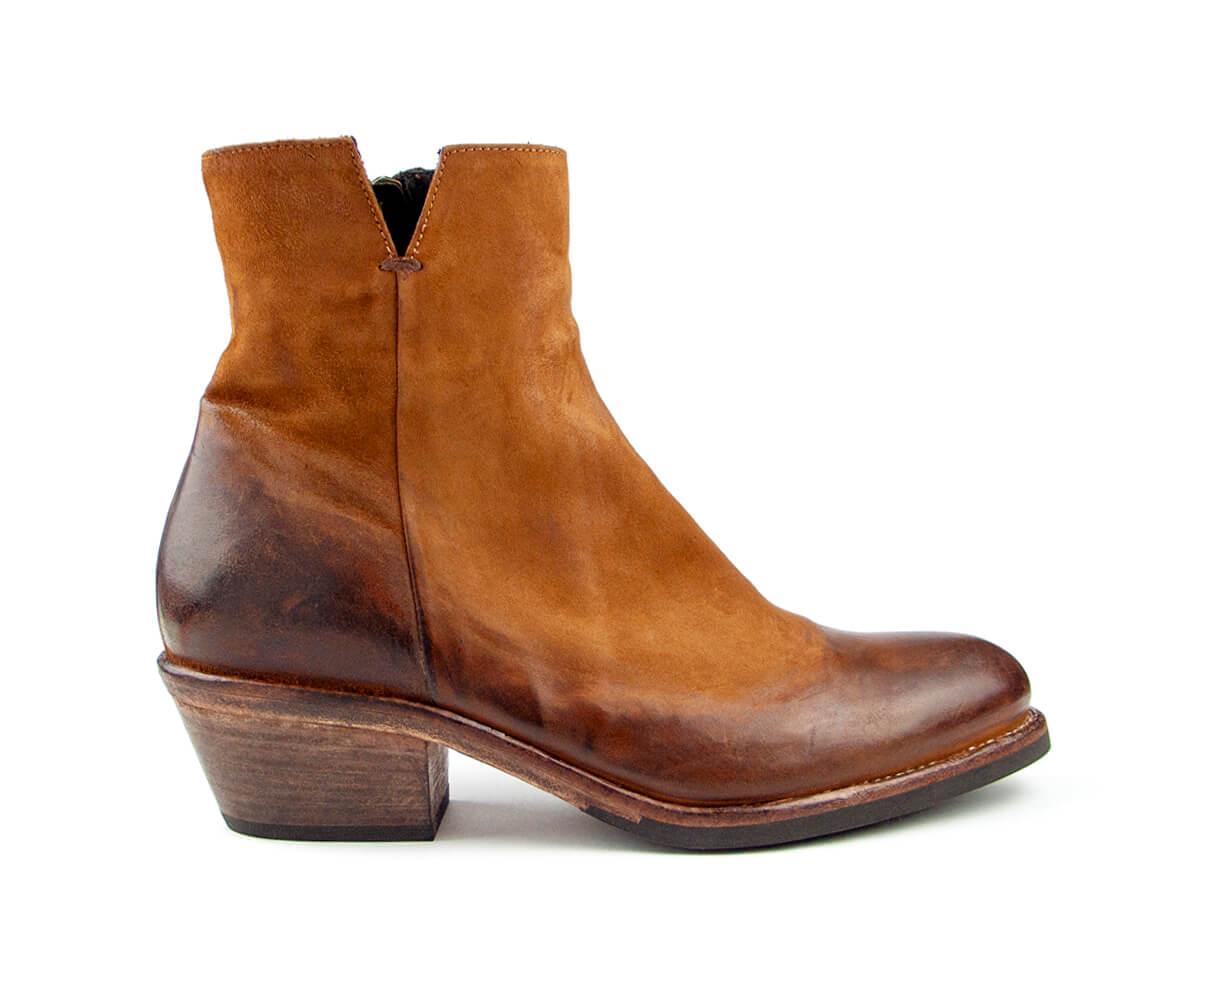 012 ecla scarpe rgb